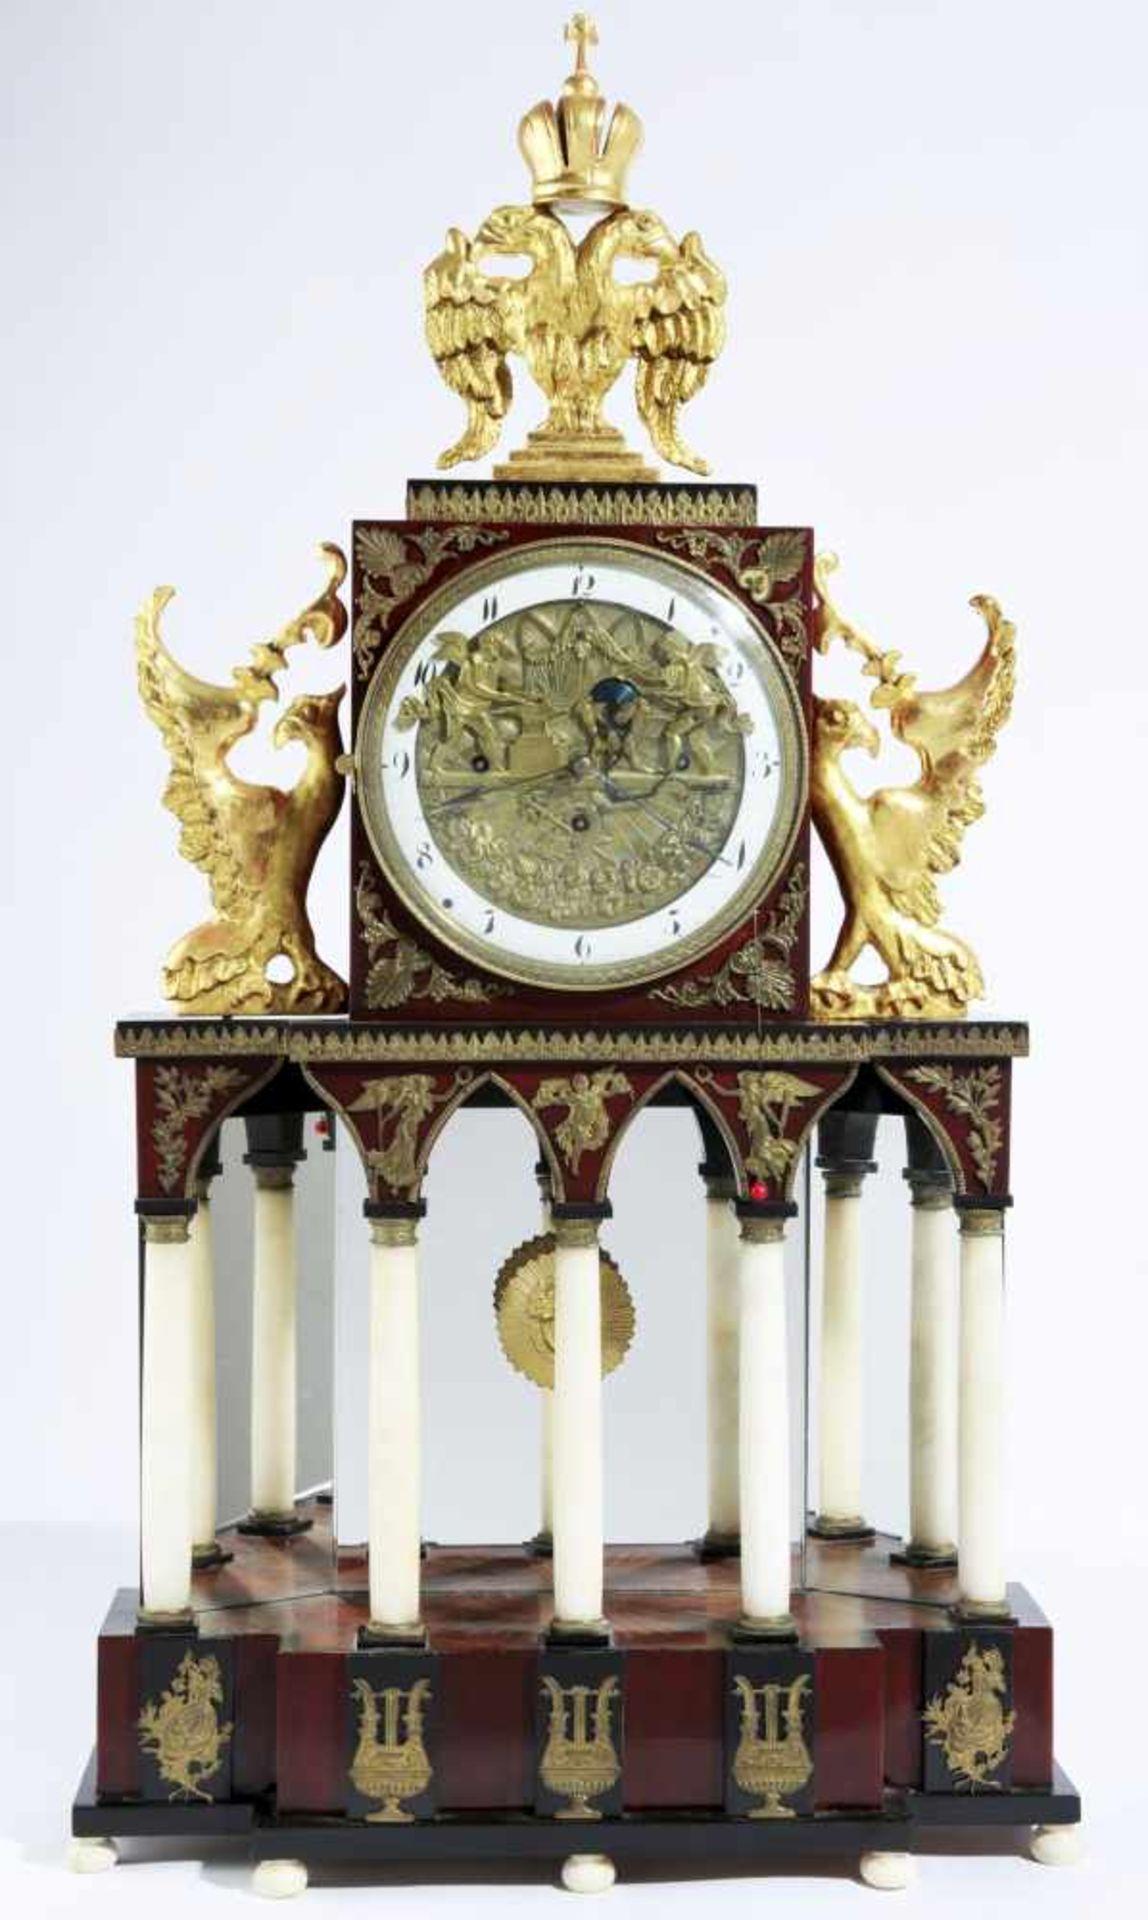 Austrian Empire automaton clock Austria, Vienna, cca 1810, gilded and blackened bronze, anchor